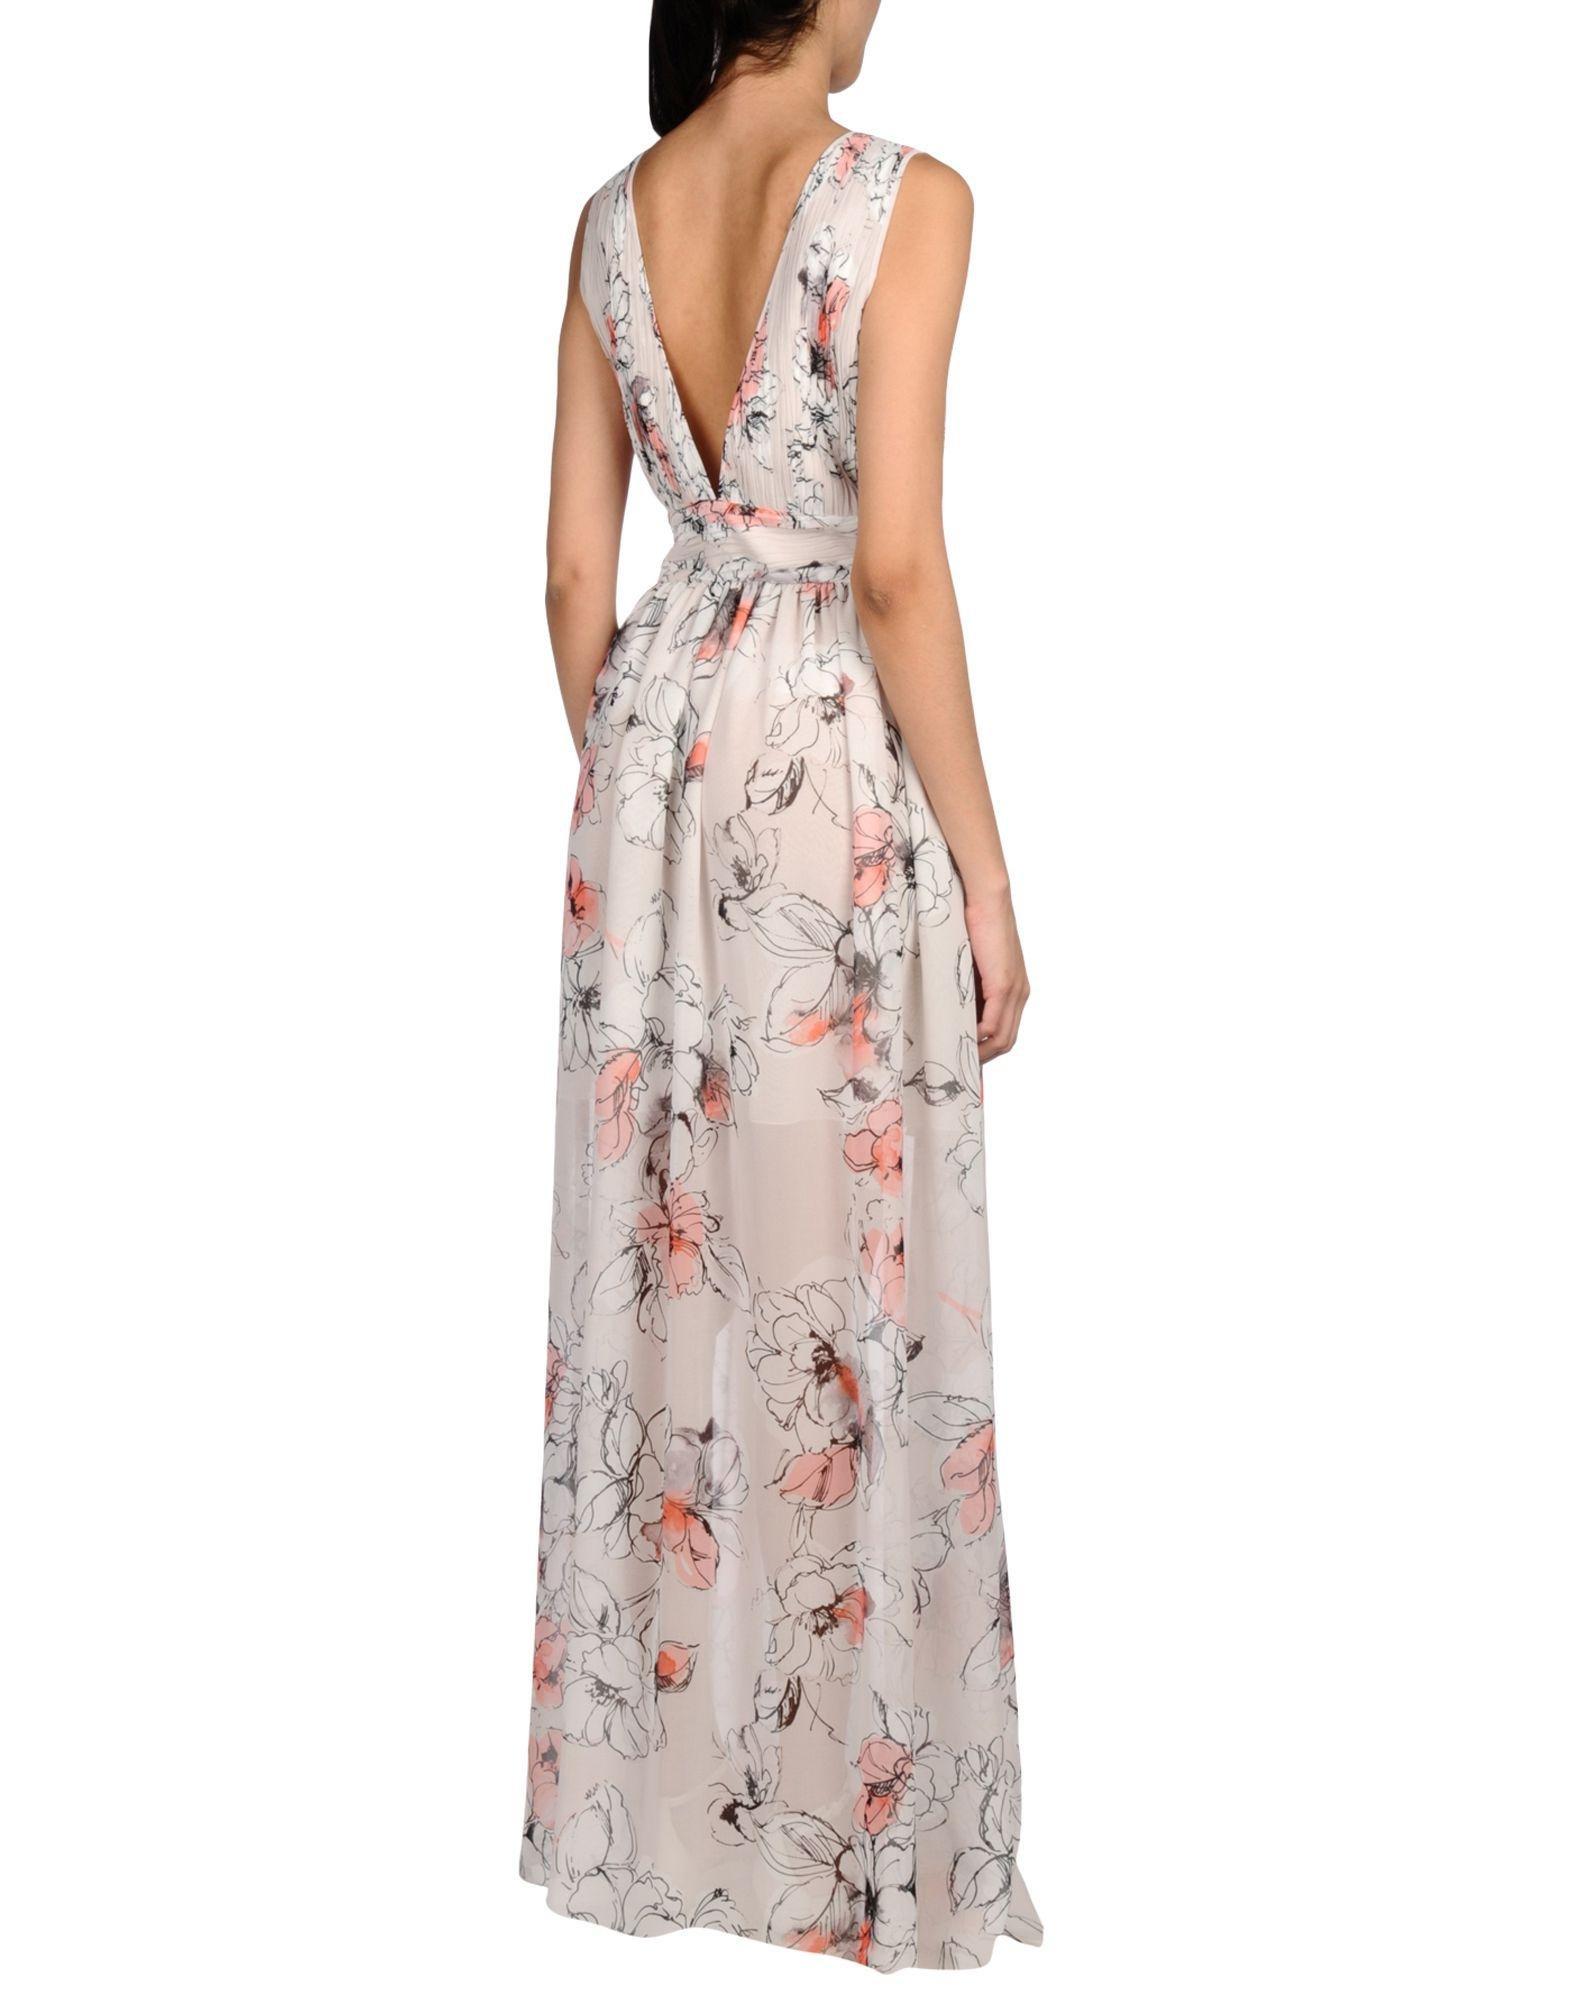 Blugirl Blumarine Synthetic Long Dress in Light Grey (Grey)